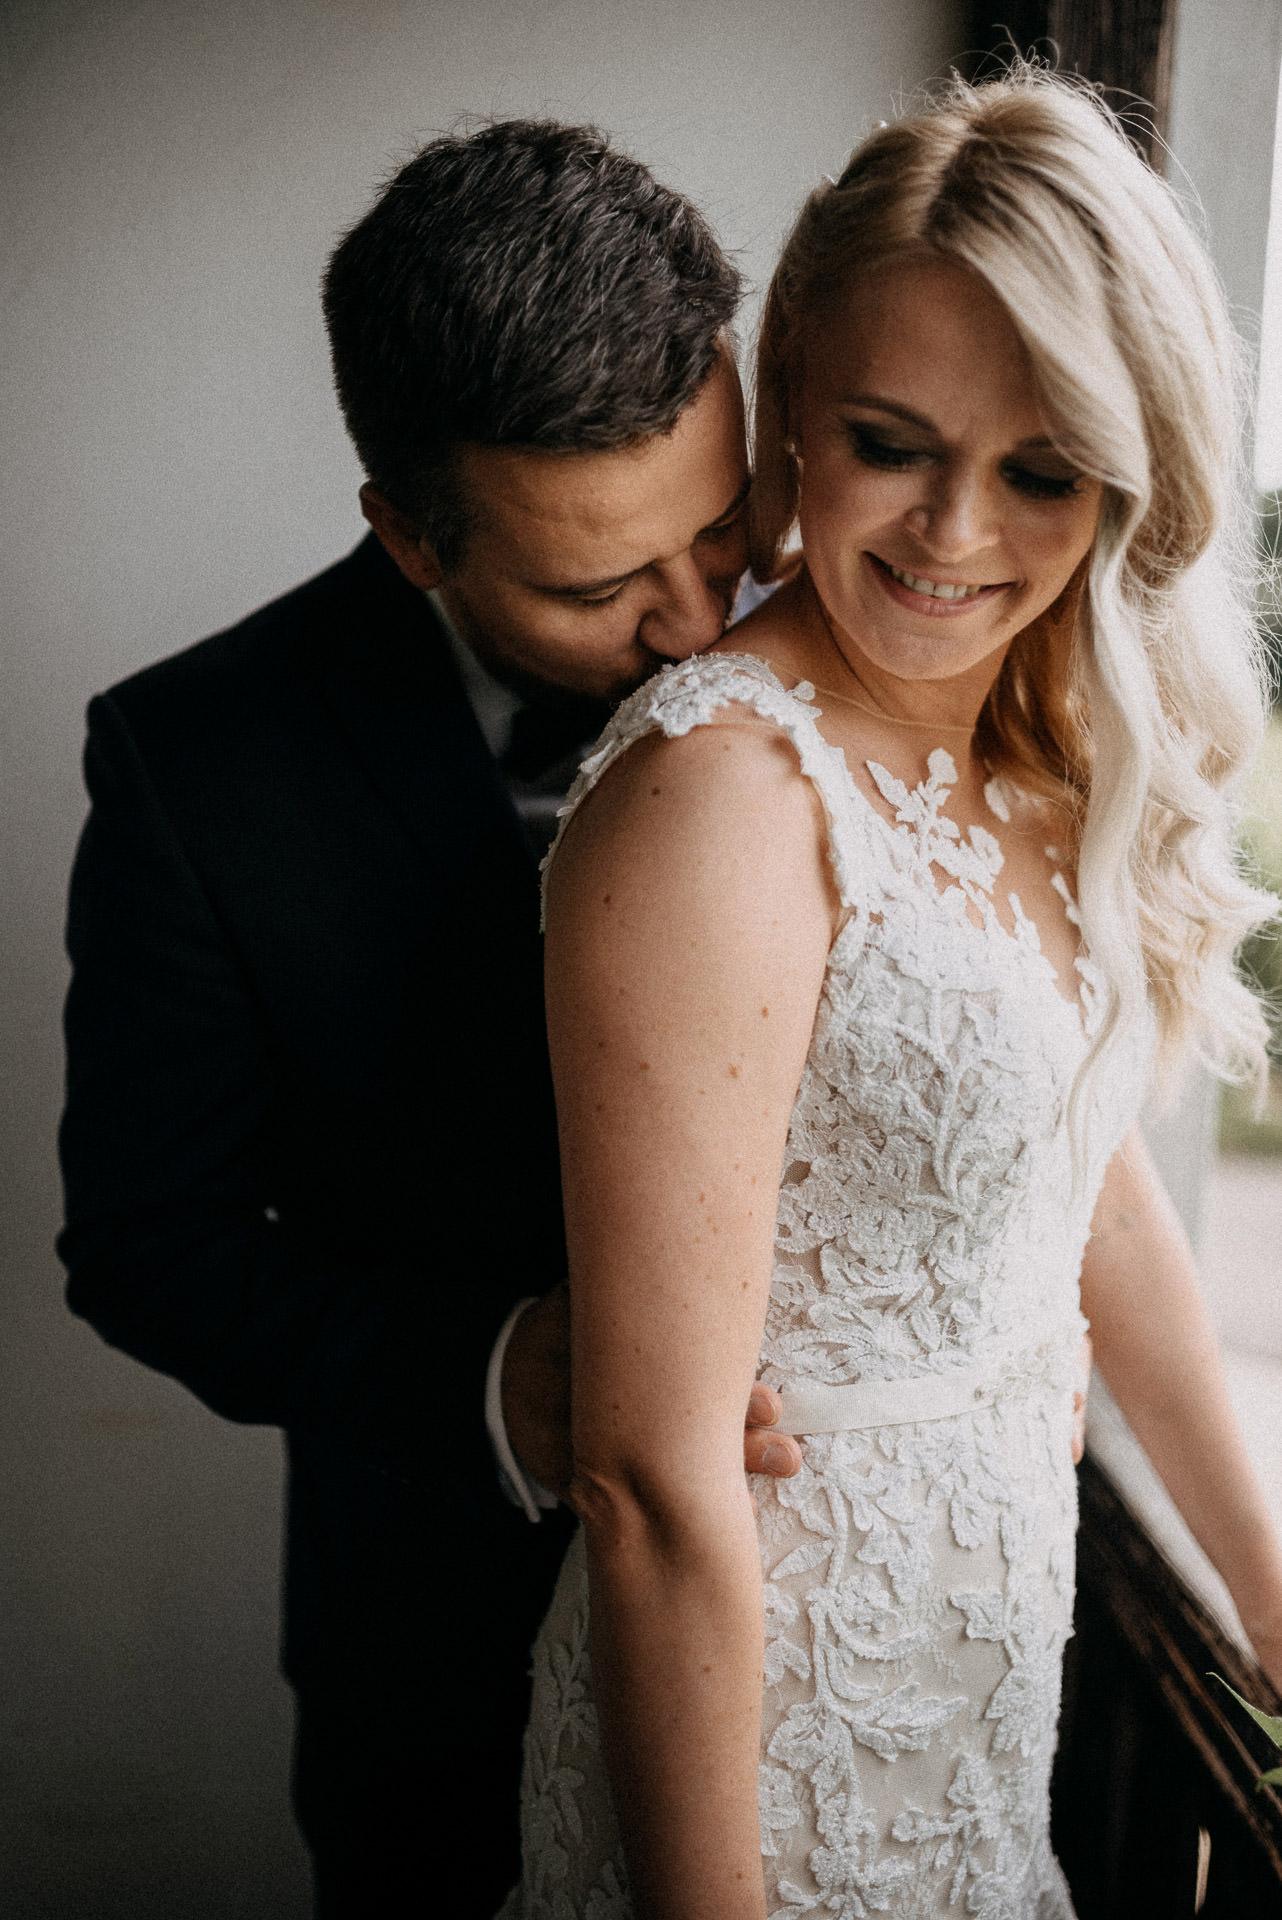 kiss csok bride groom menyasszony volegeny intimate meghitt